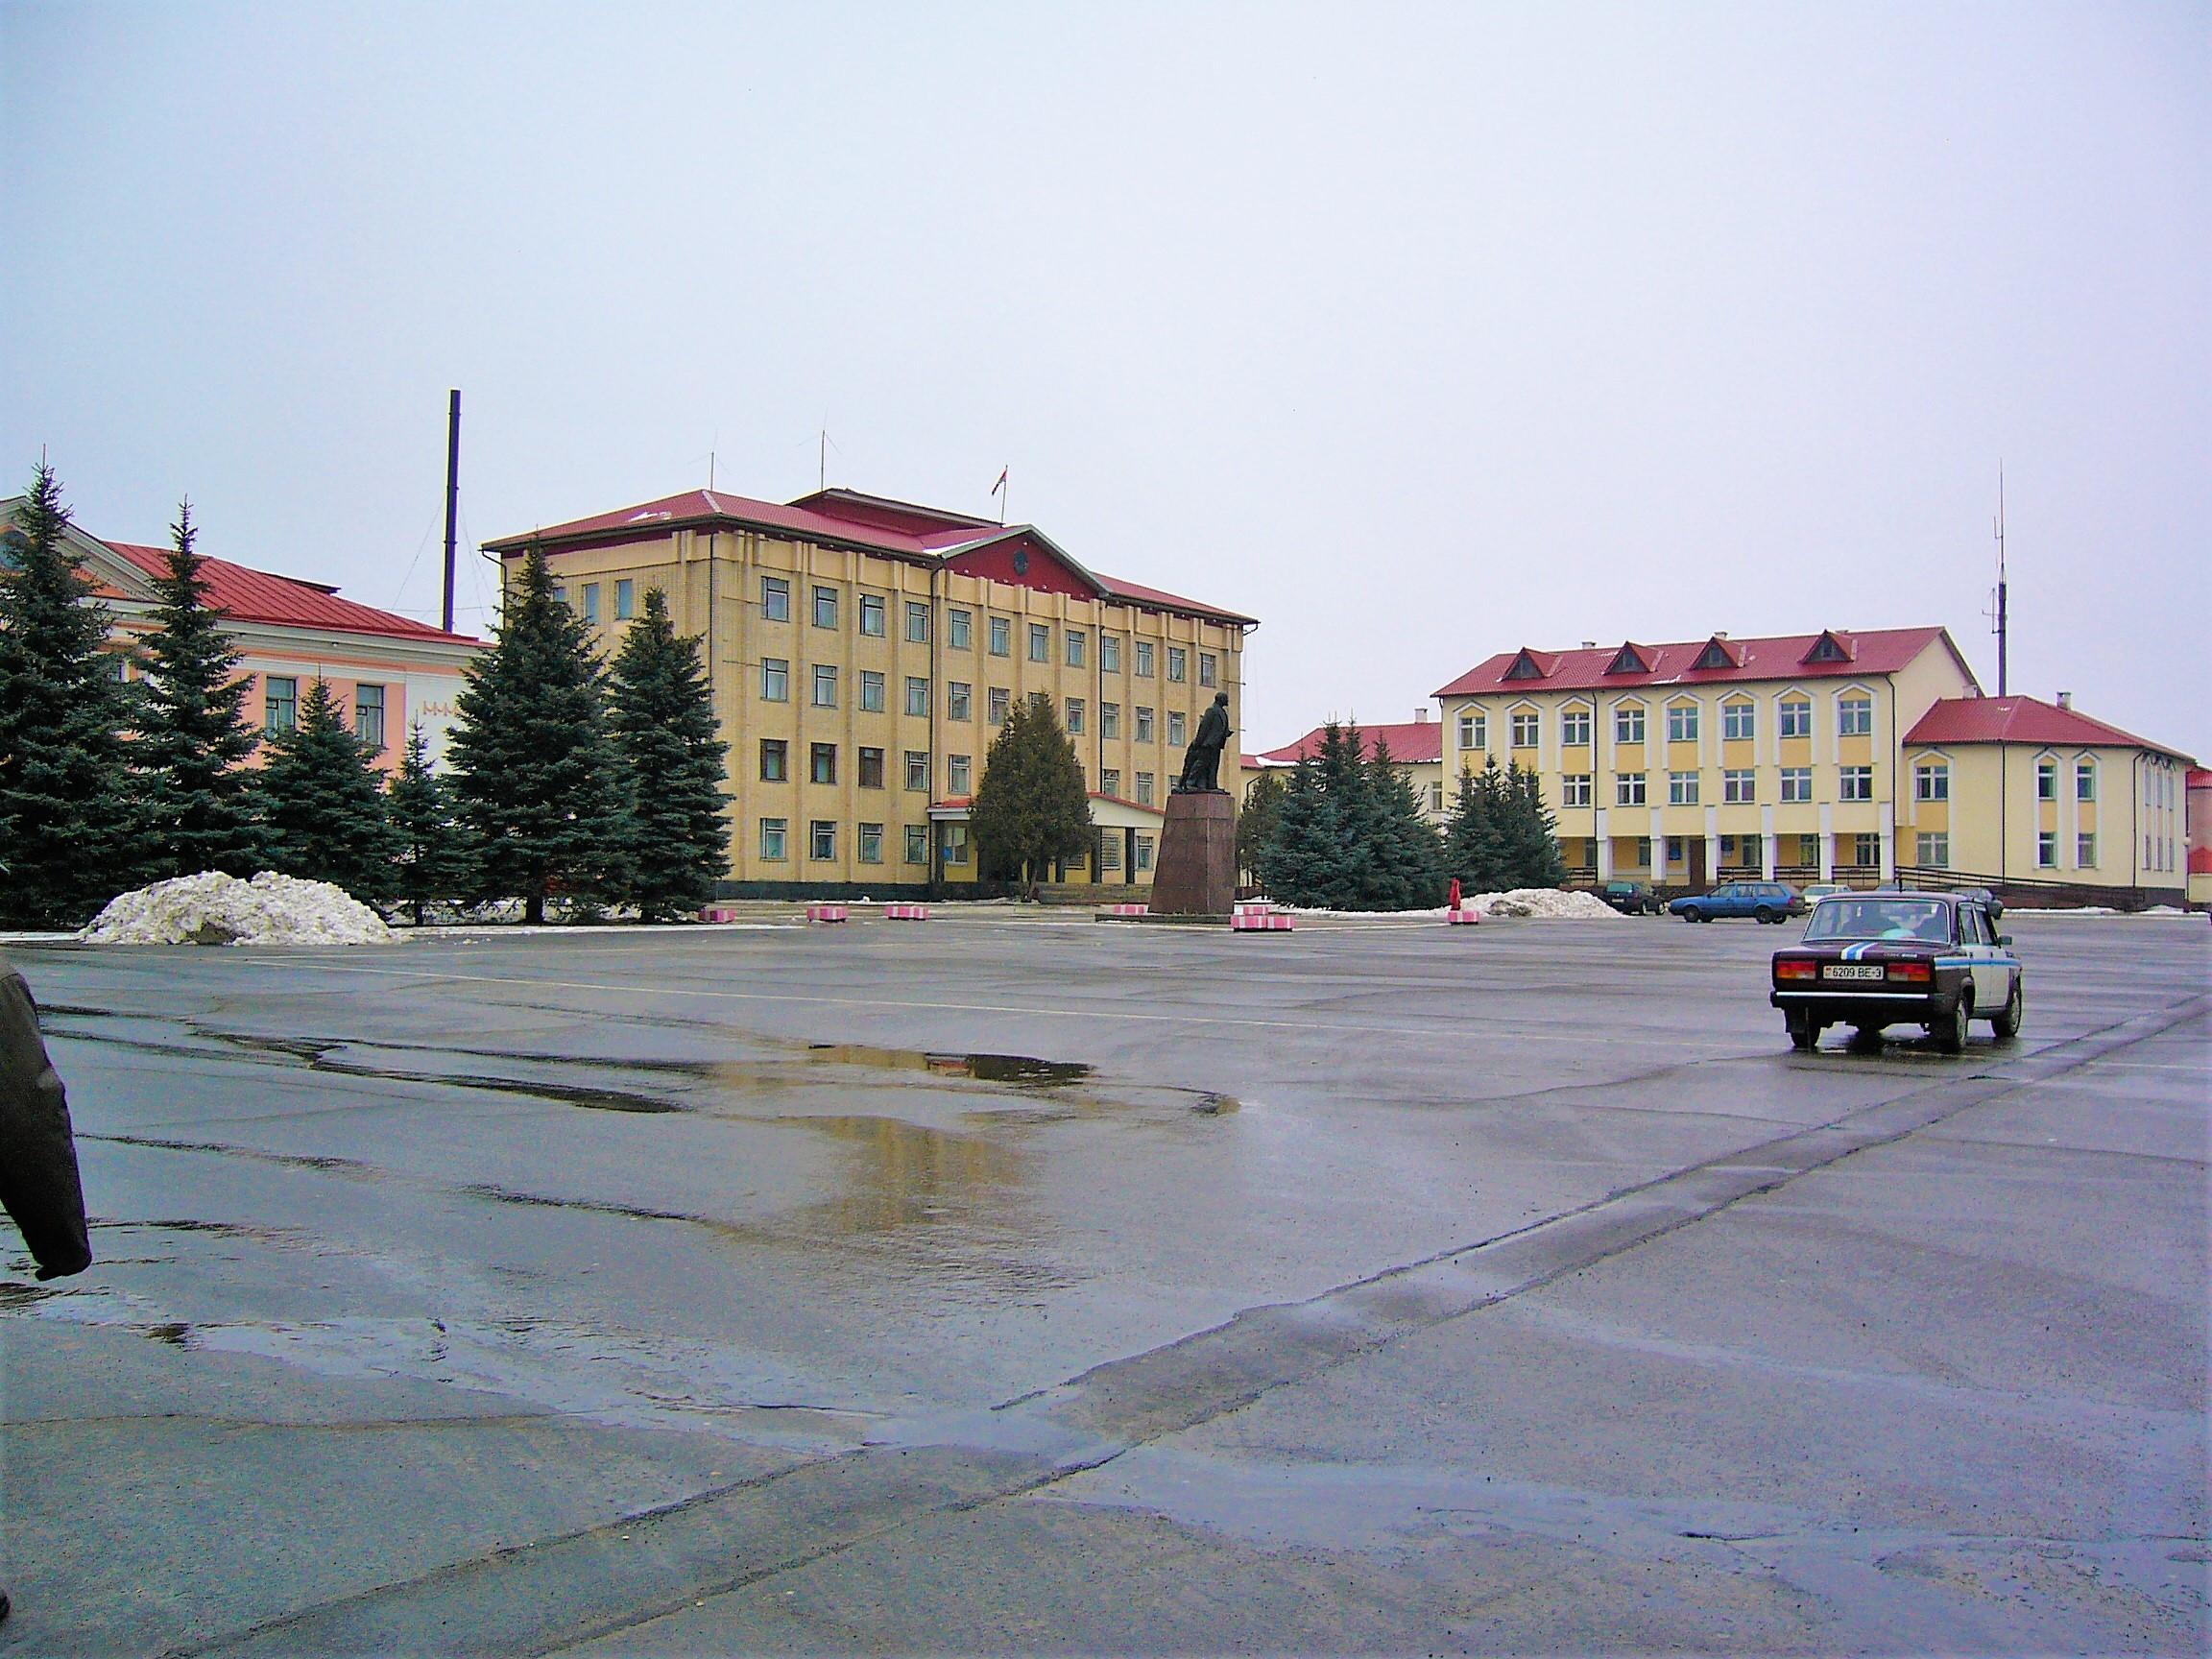 Petrykau